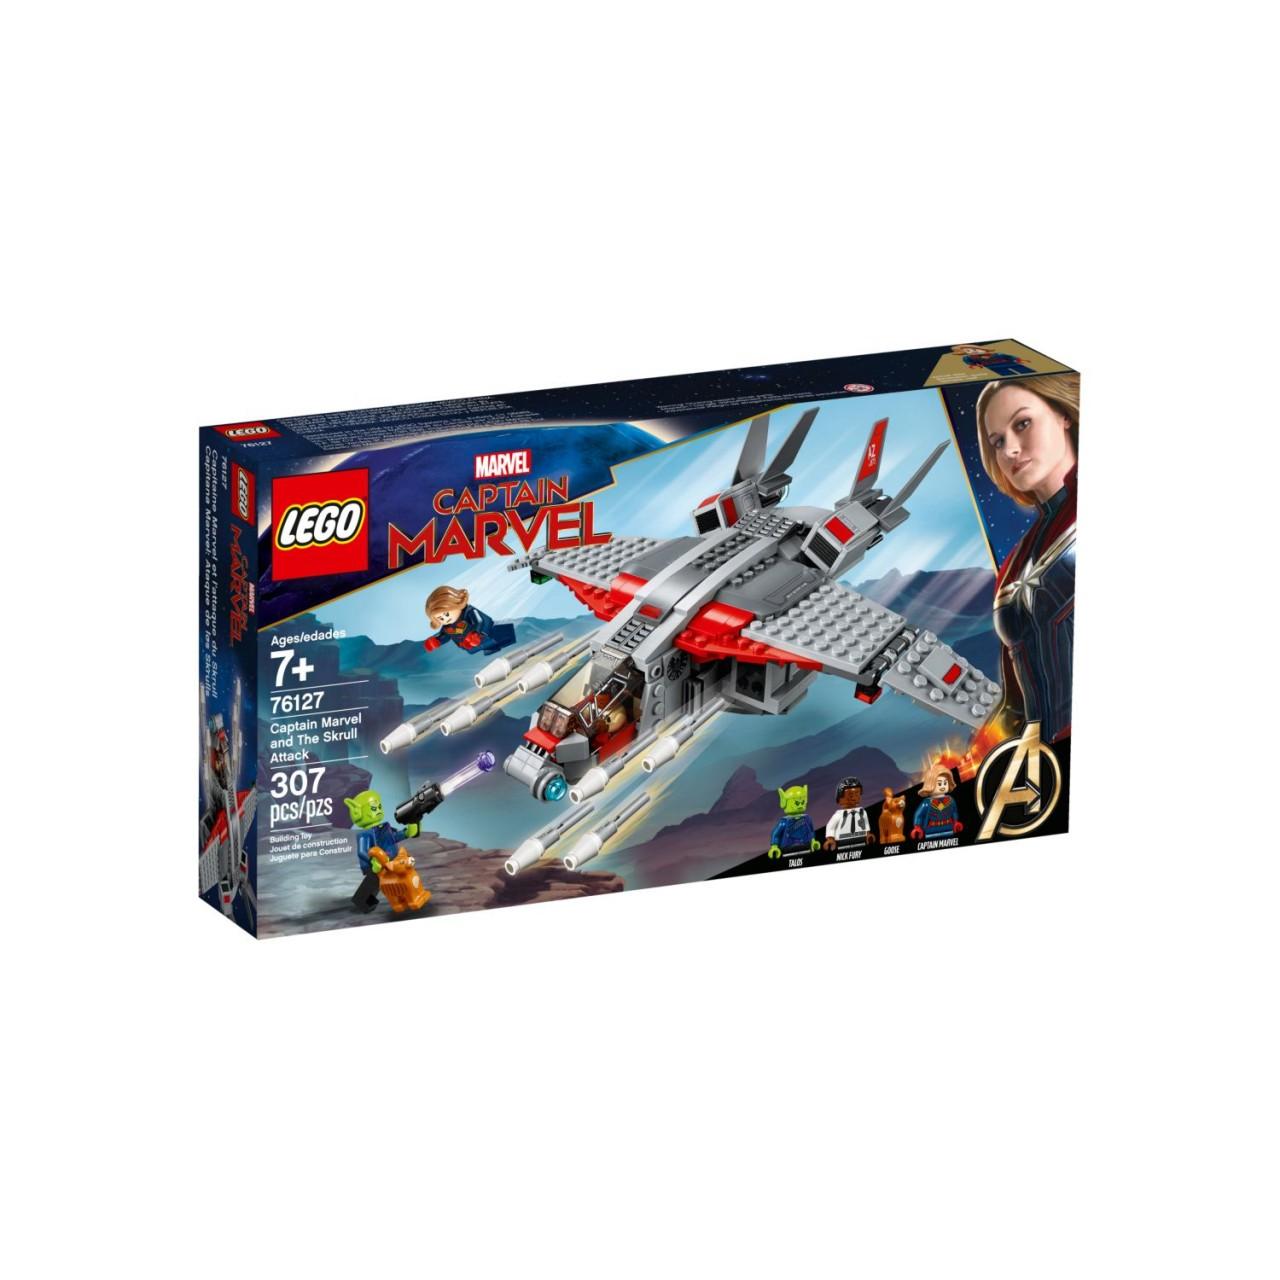 LEGO MARVEL SUPER HEROES 76127 Captain Marvel und die Skrull-Attacke